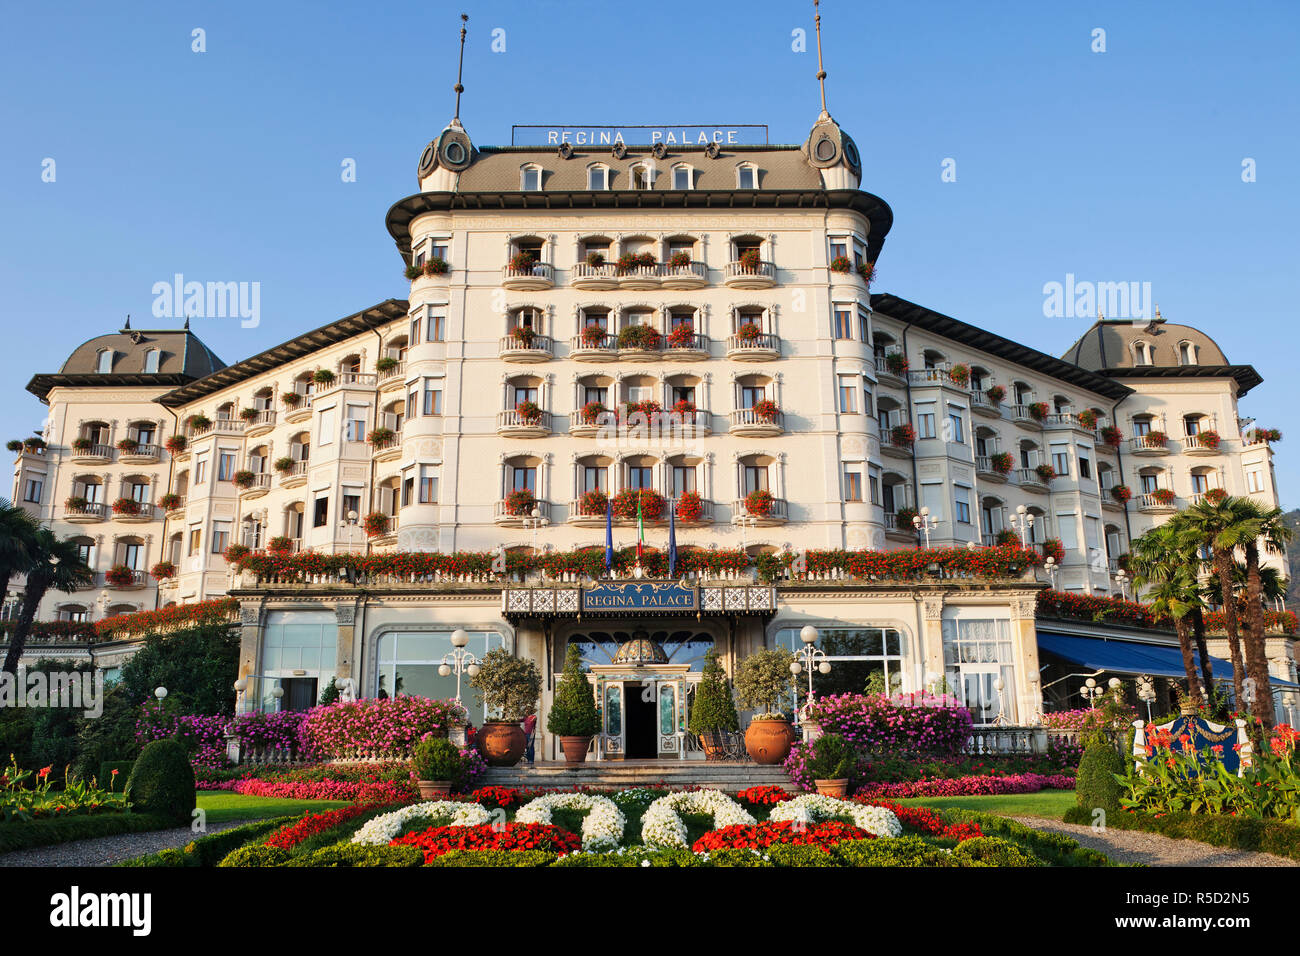 Italy, Piedmont, Lake Maggiore, Stresa, Regina Palace Hotel - Stock Image